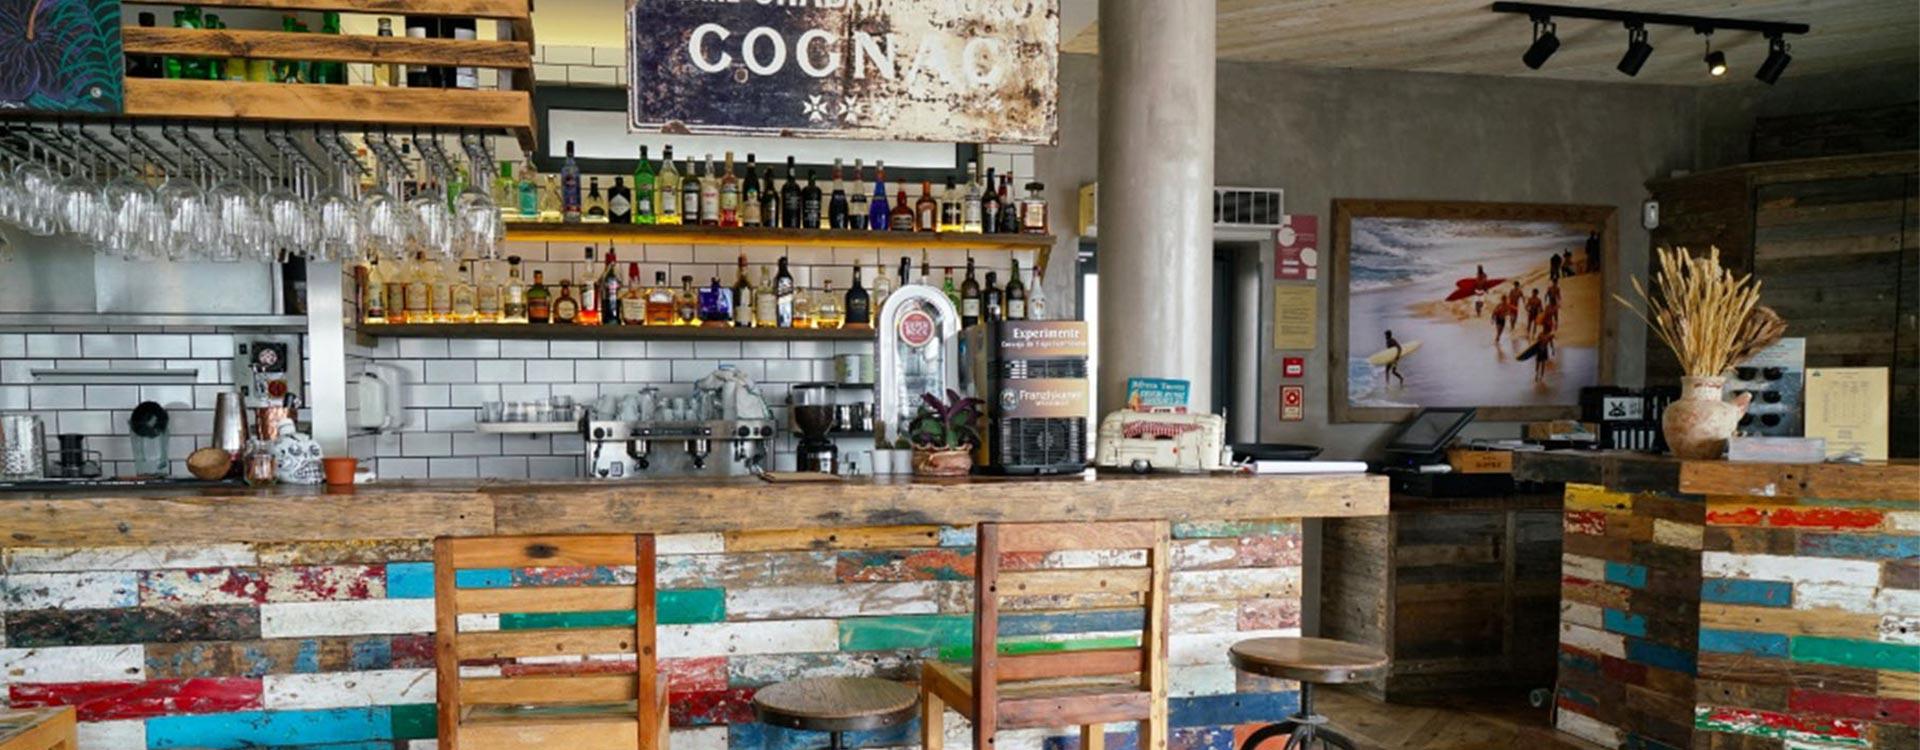 surfers-lodge-restaurant-vibe-bar